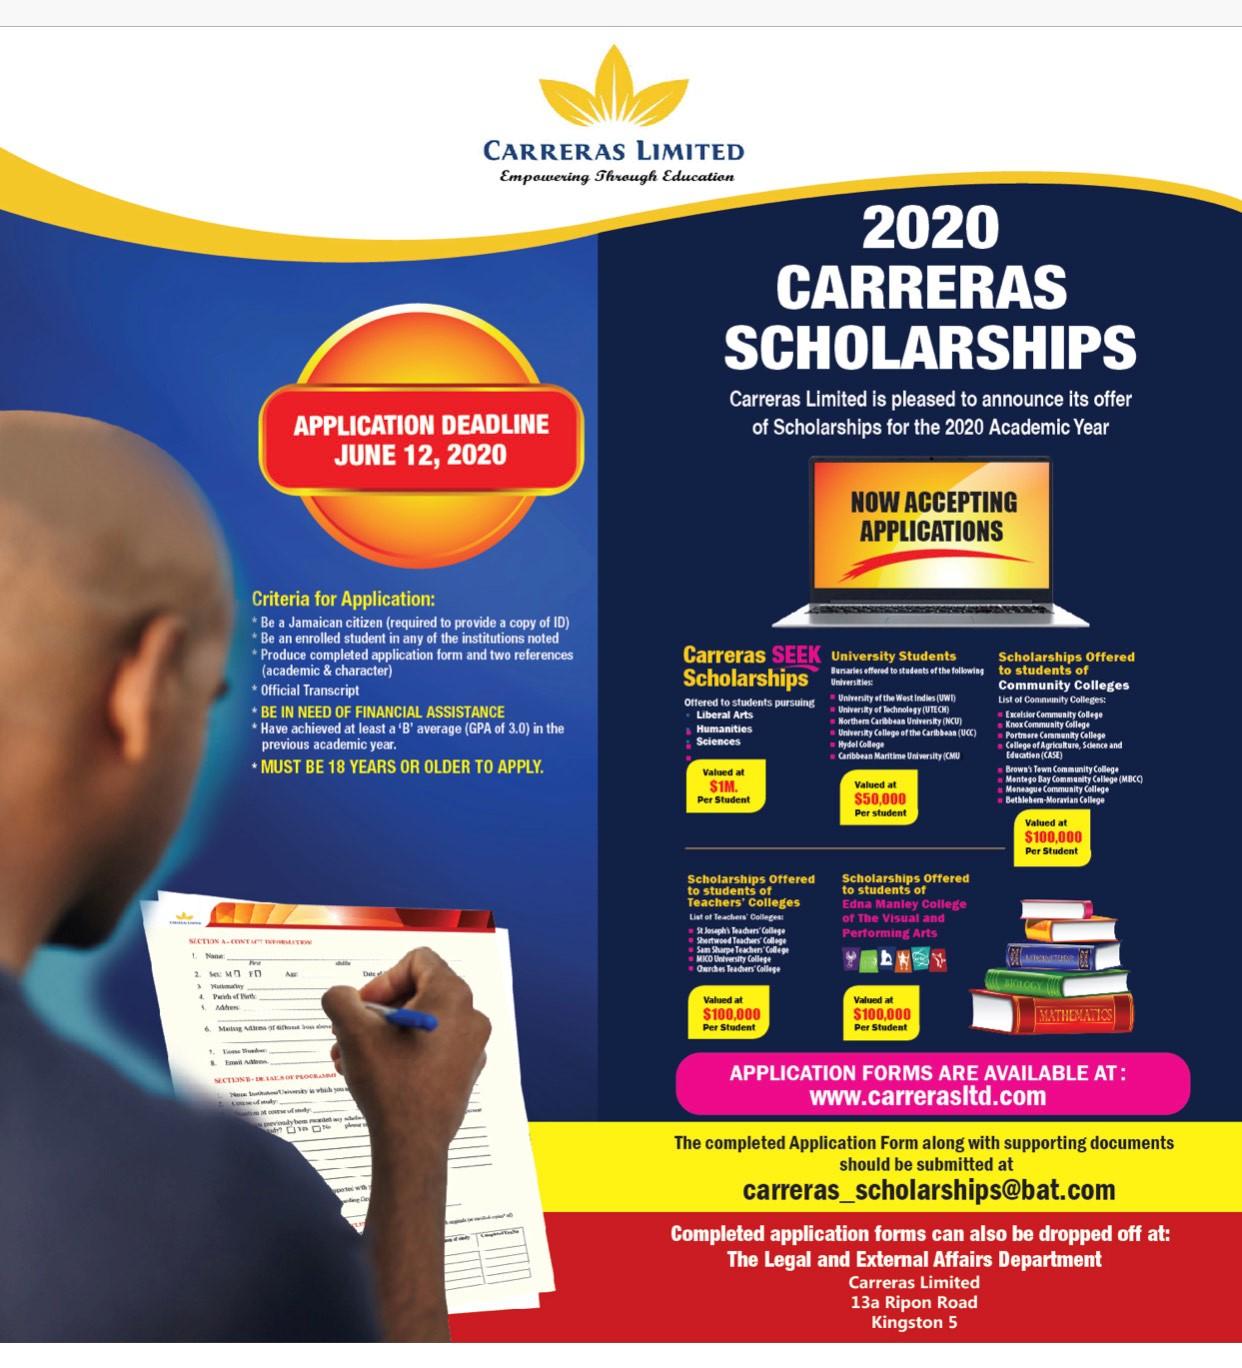 2020 Carreras Scholarships